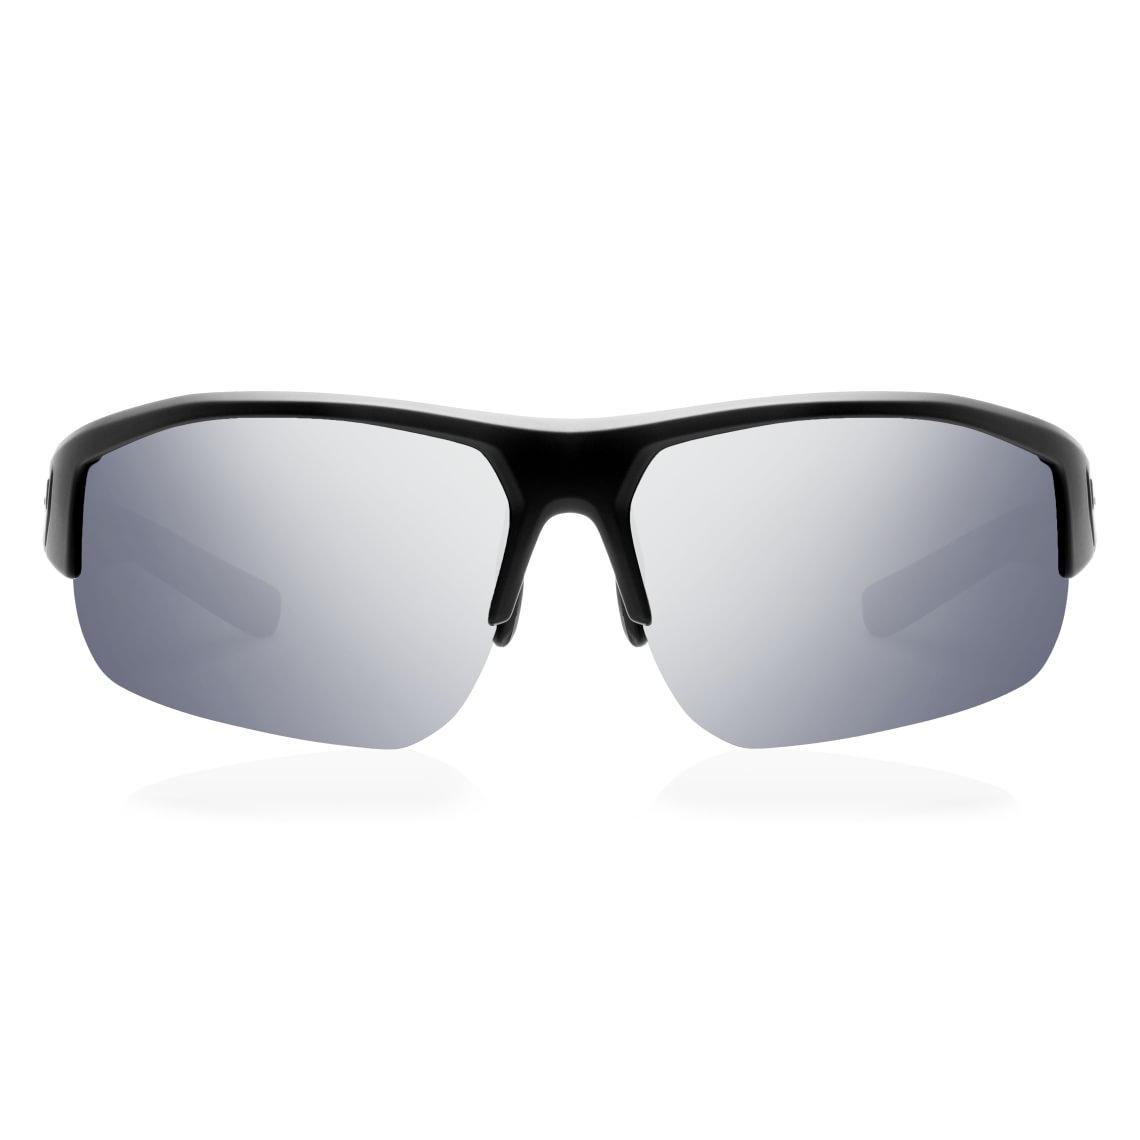 Henrik Stenson Eyewear Stinger Black